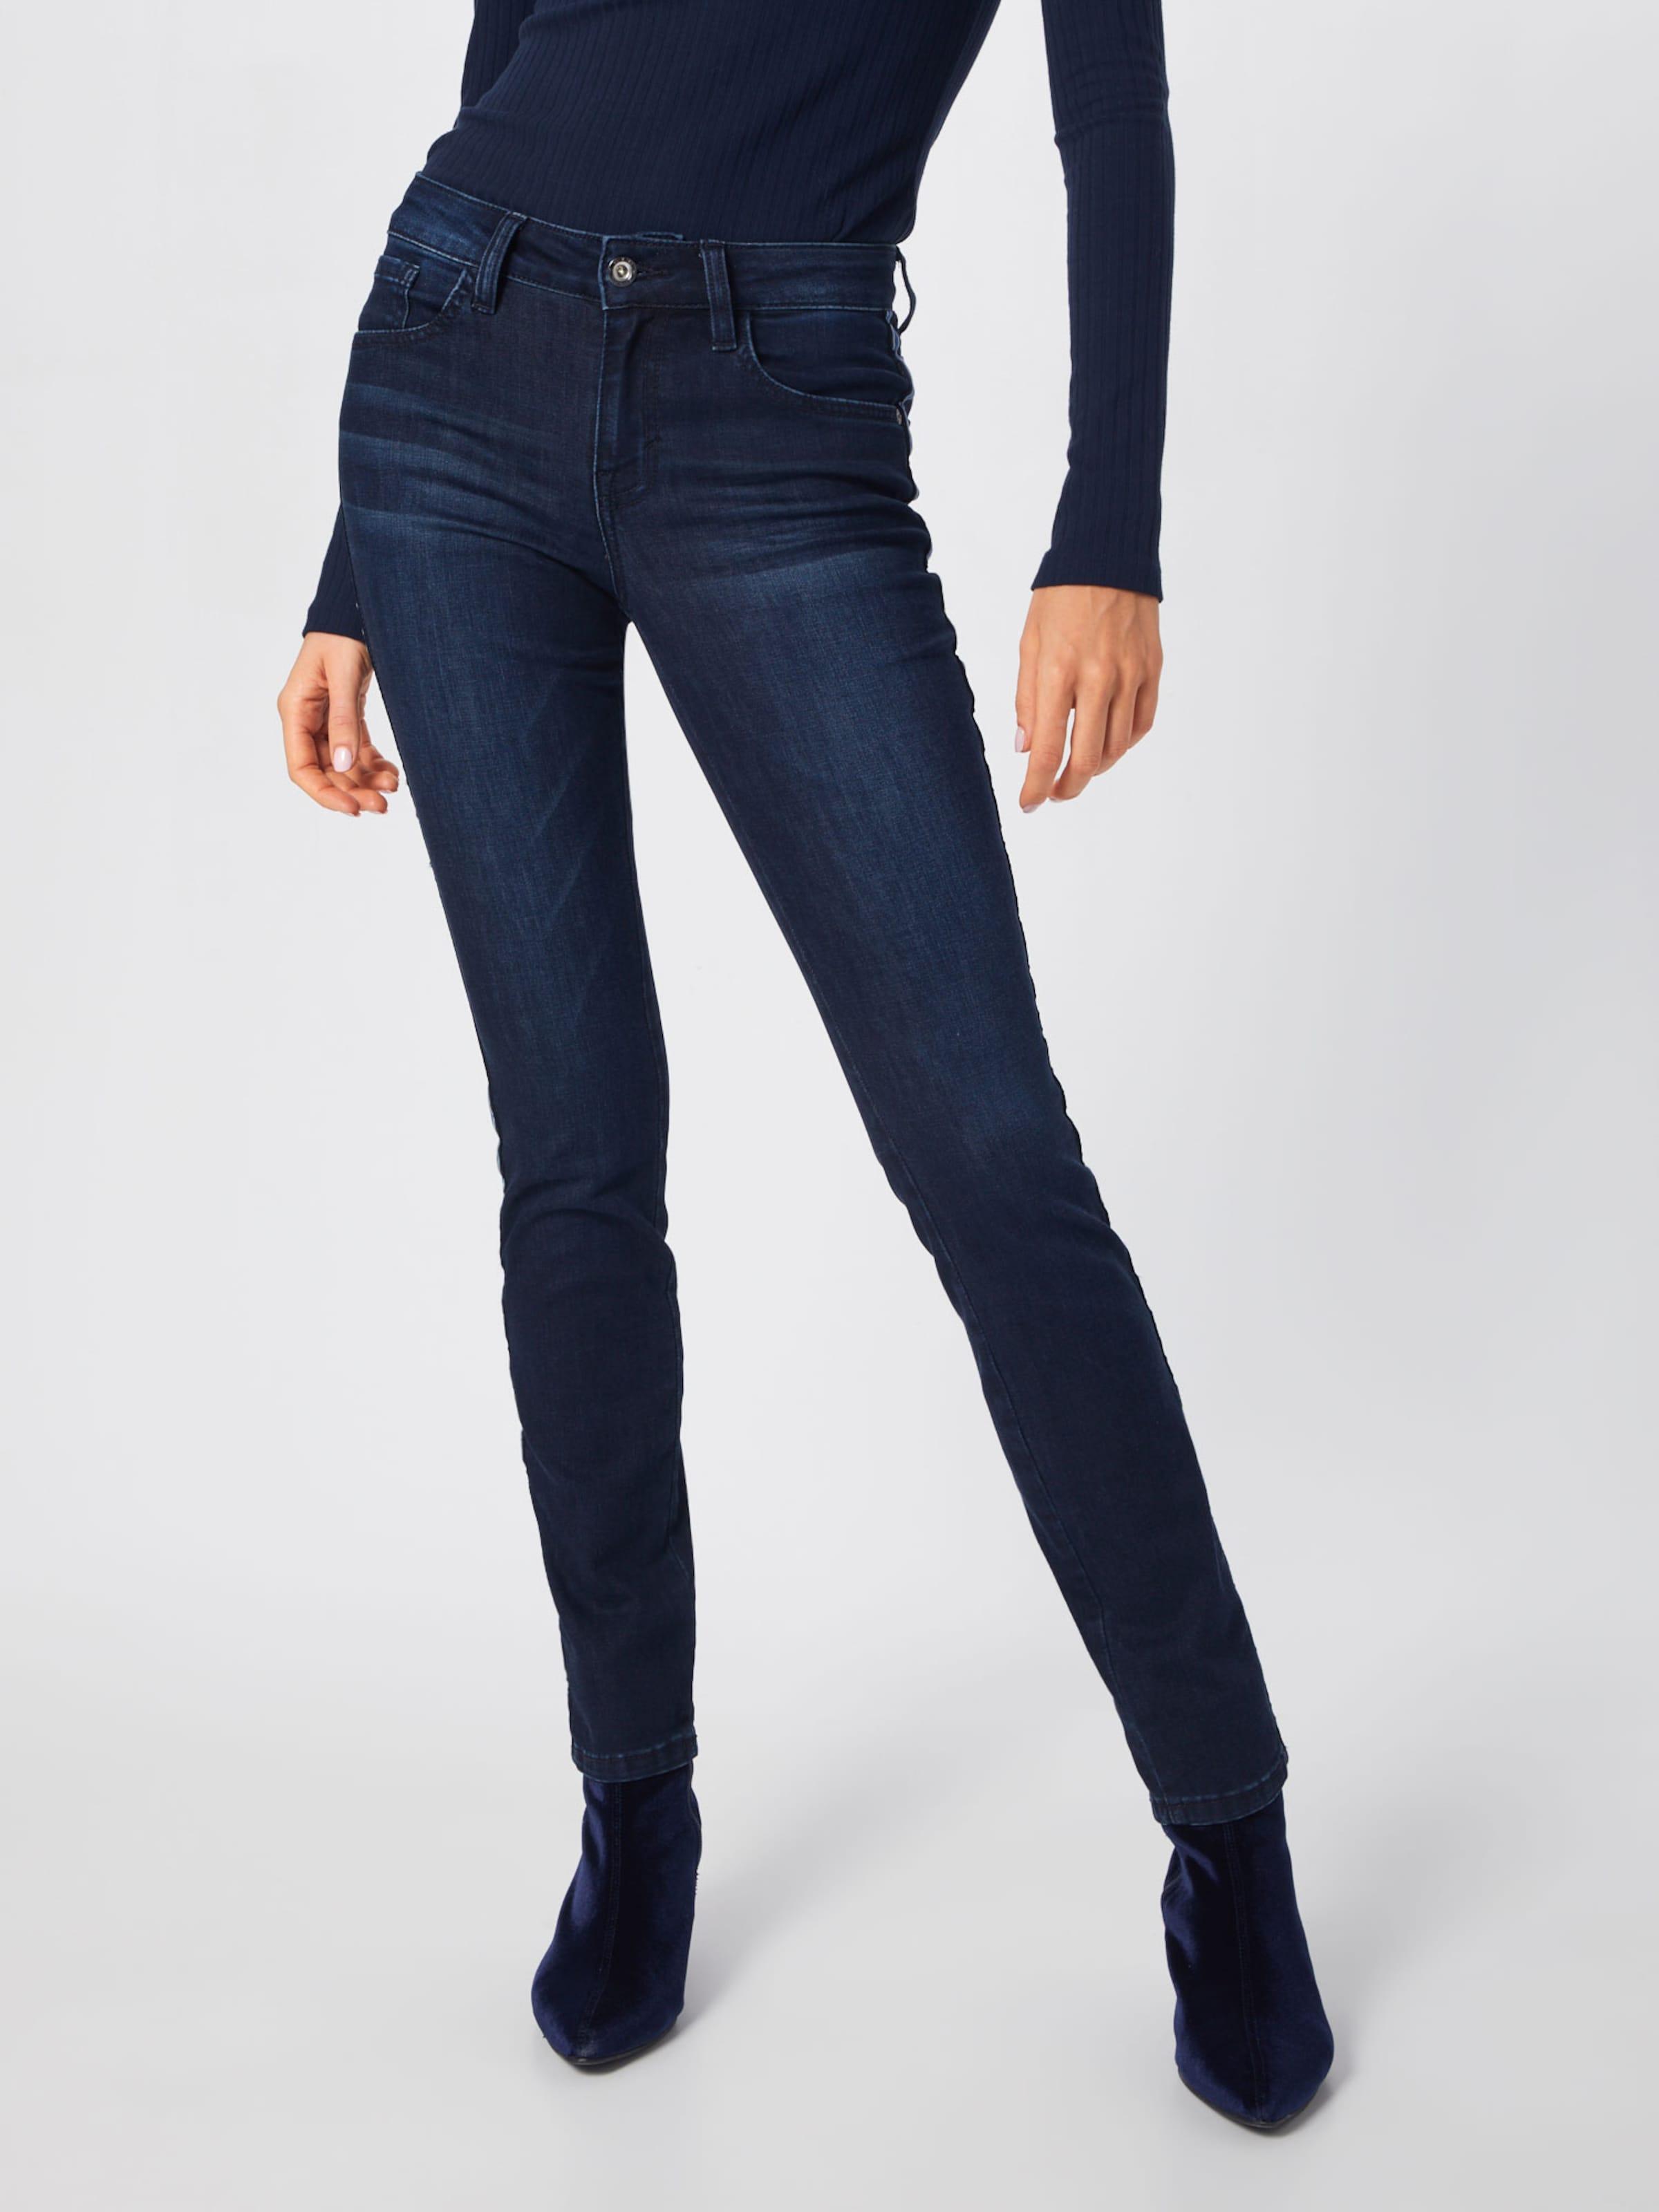 Jeans Blue Tailor Tom In 'alexa' Denim MzVSqULpG